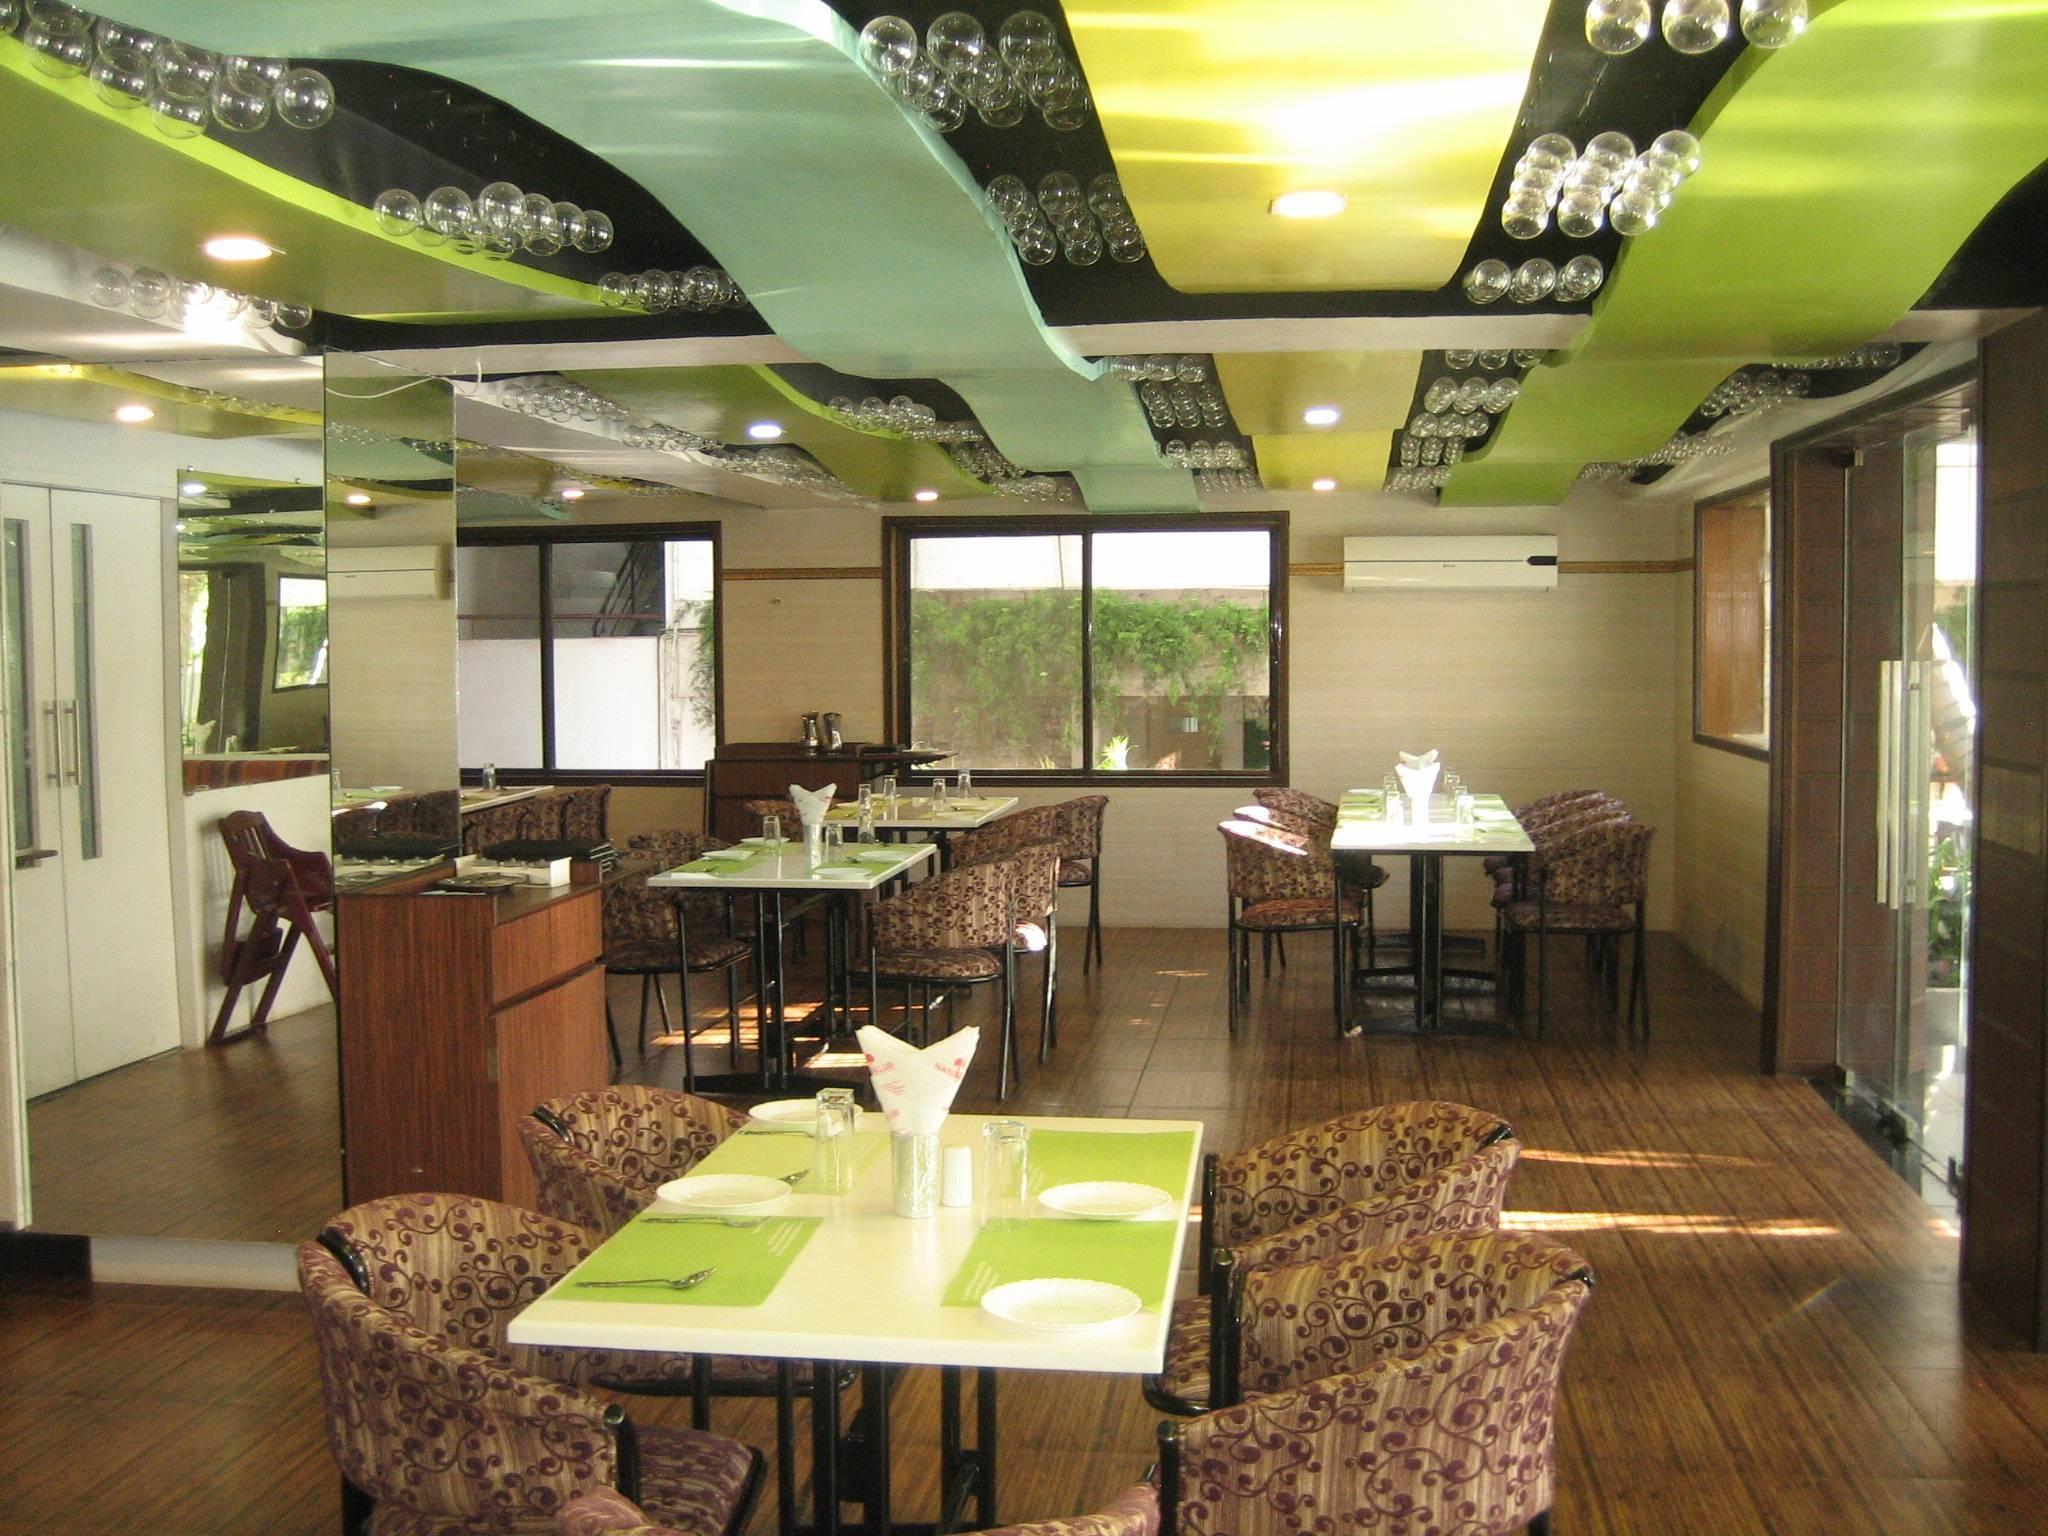 Nandinee Woodlands Restaurant - Nashik Image